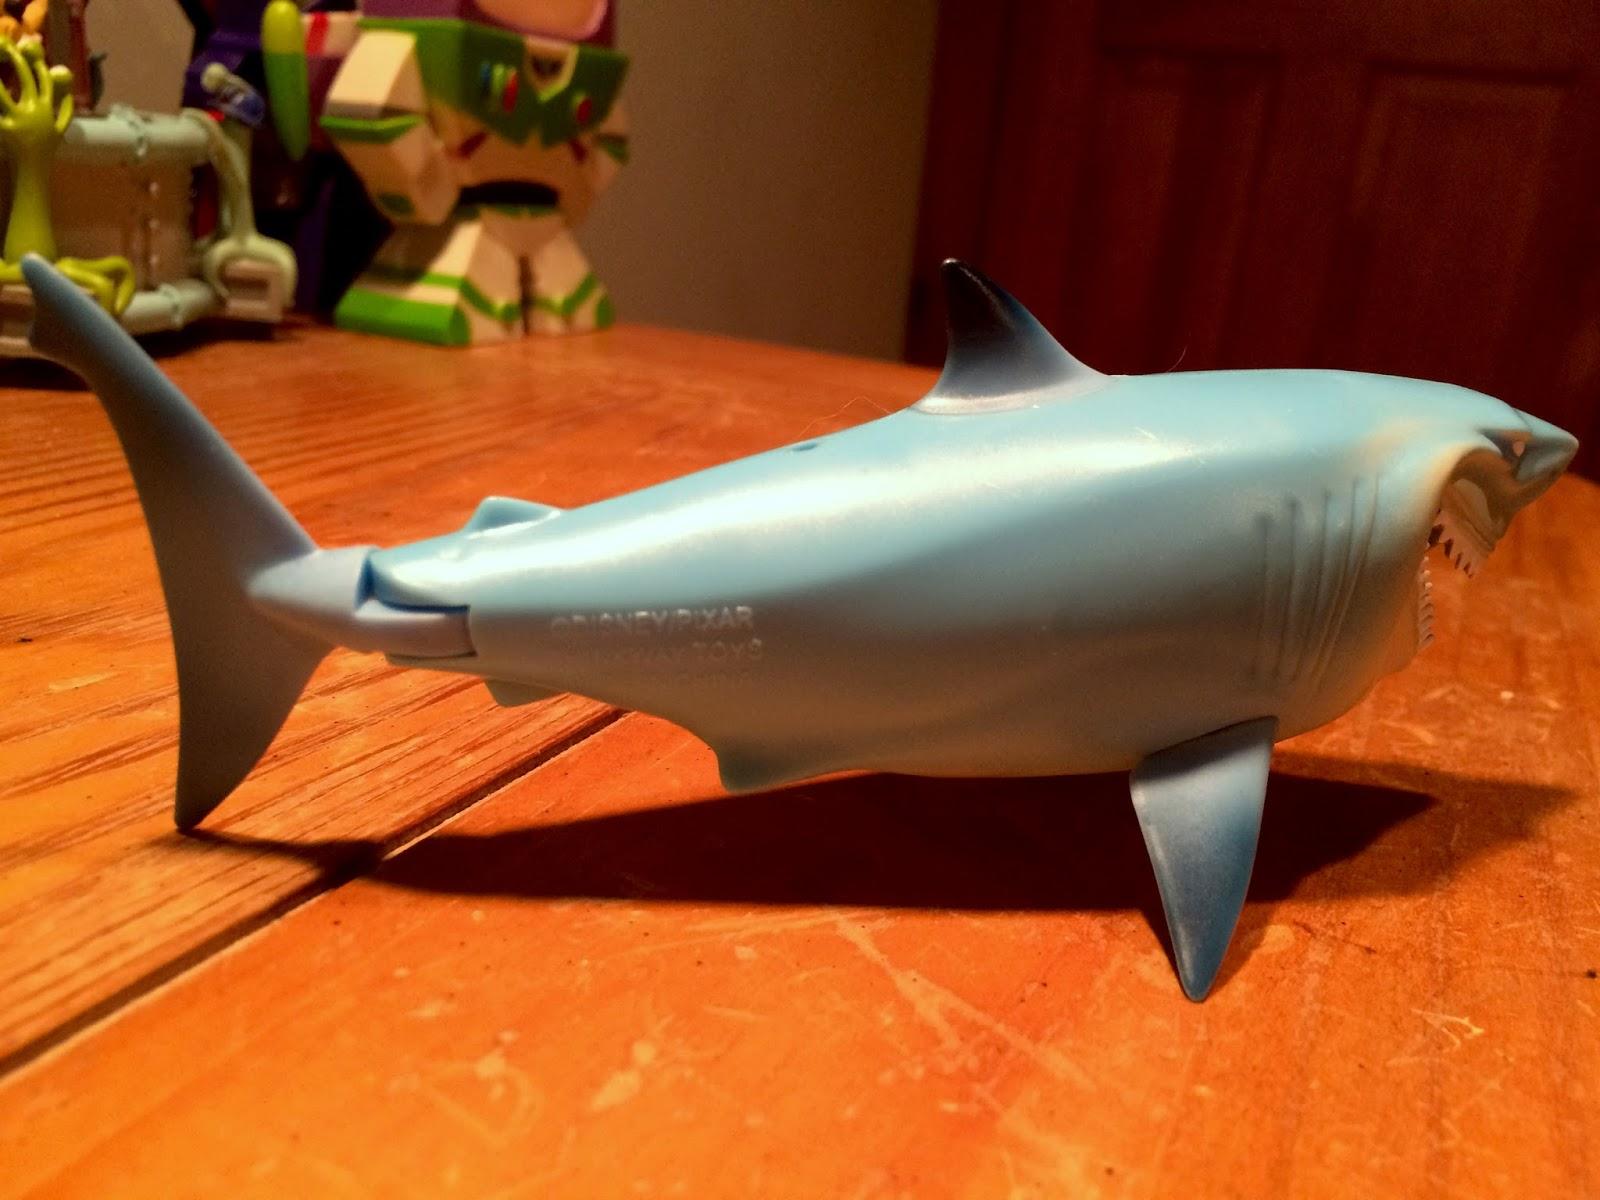 Finding Nemo Toys : Dan the pixar fan finding nemo thinkway toys bruce figure